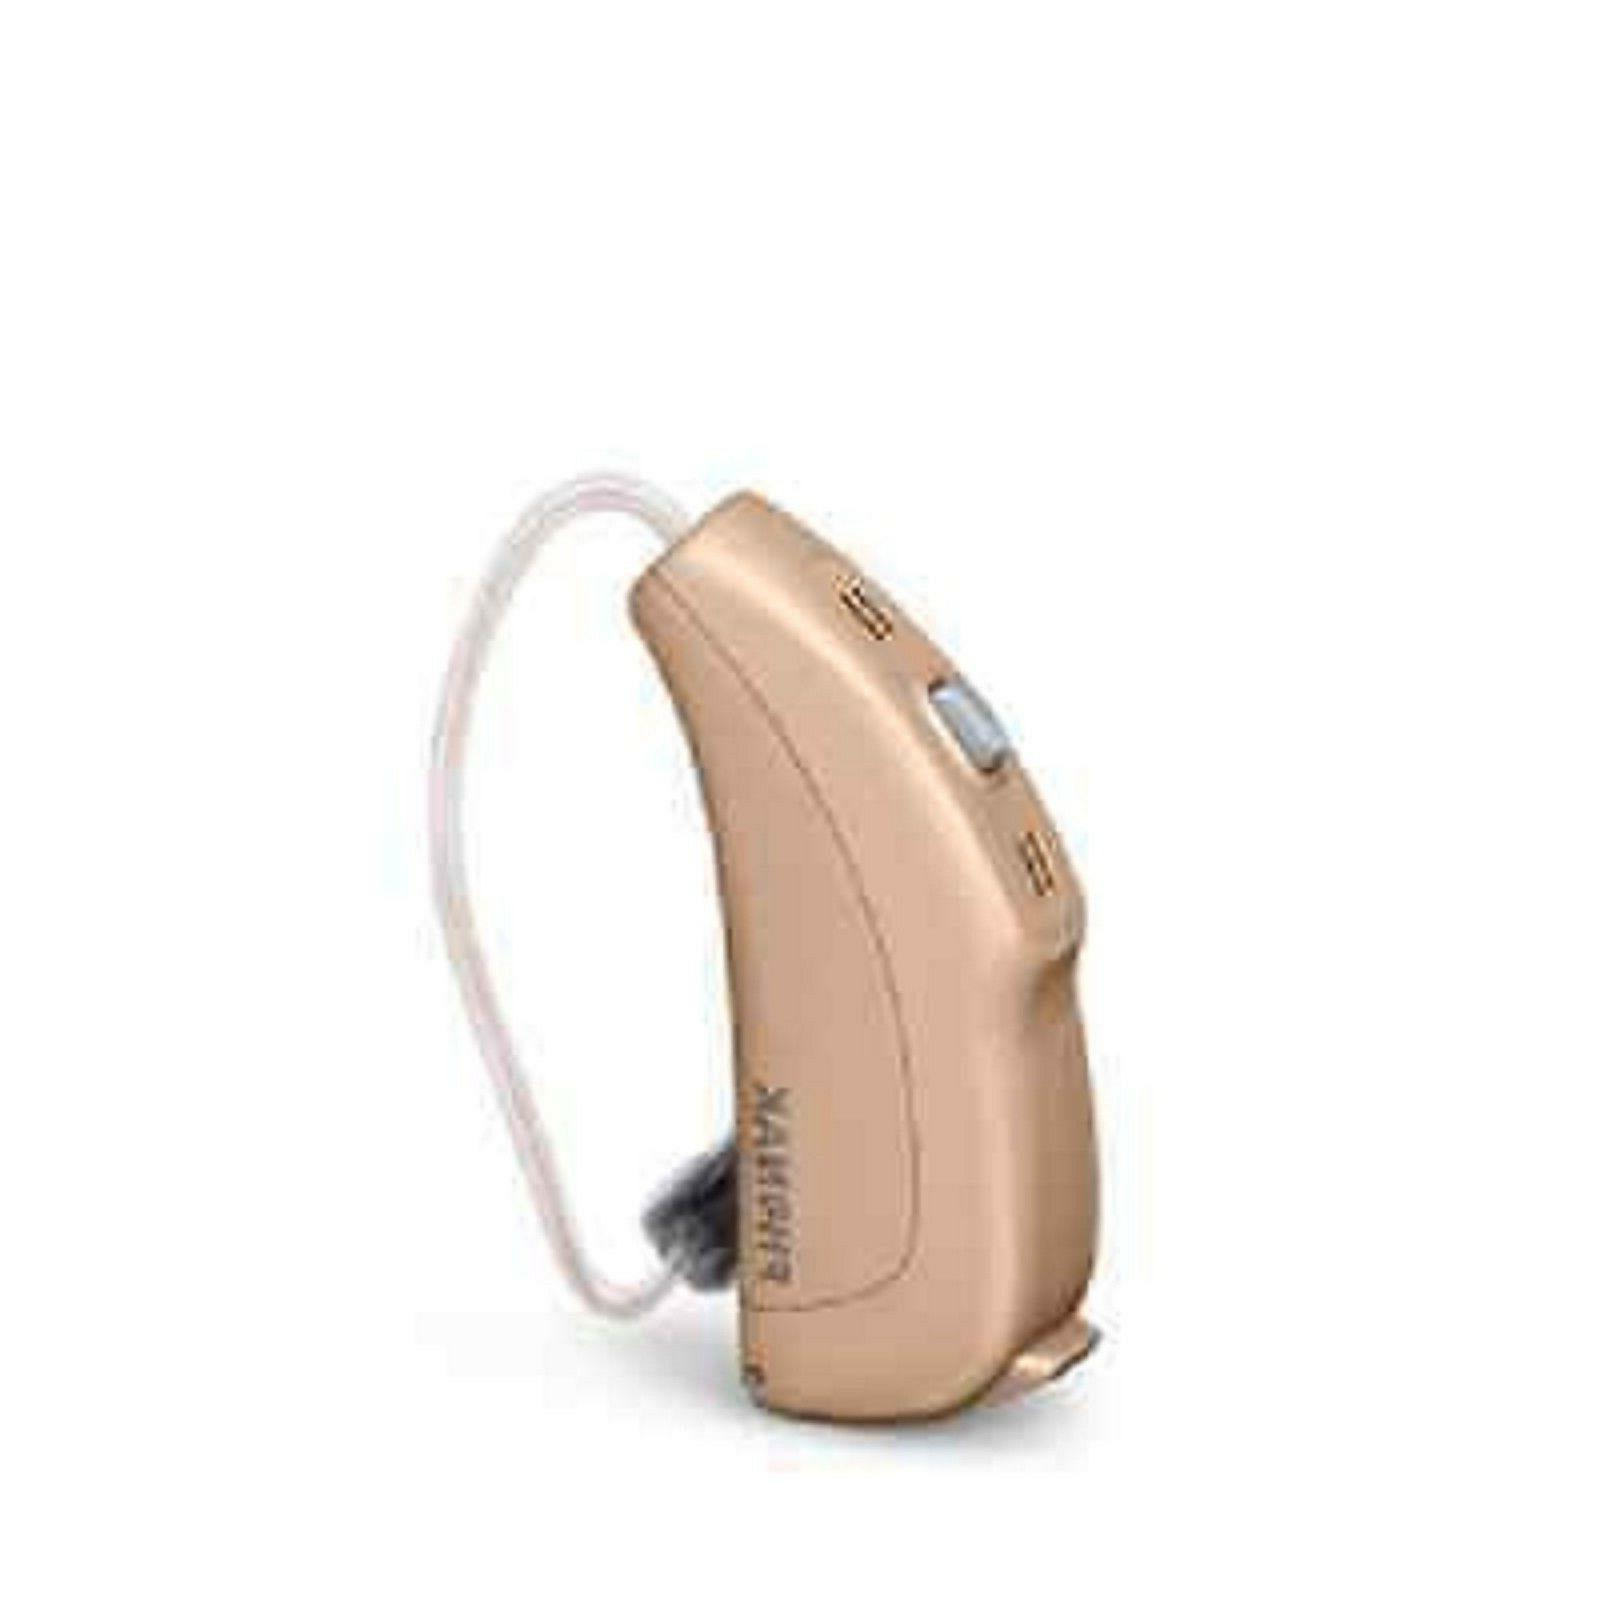 PHONAK NAIDA Q30 RIC 8 CHANNEL HEARING AIDS FREE SHIPPING